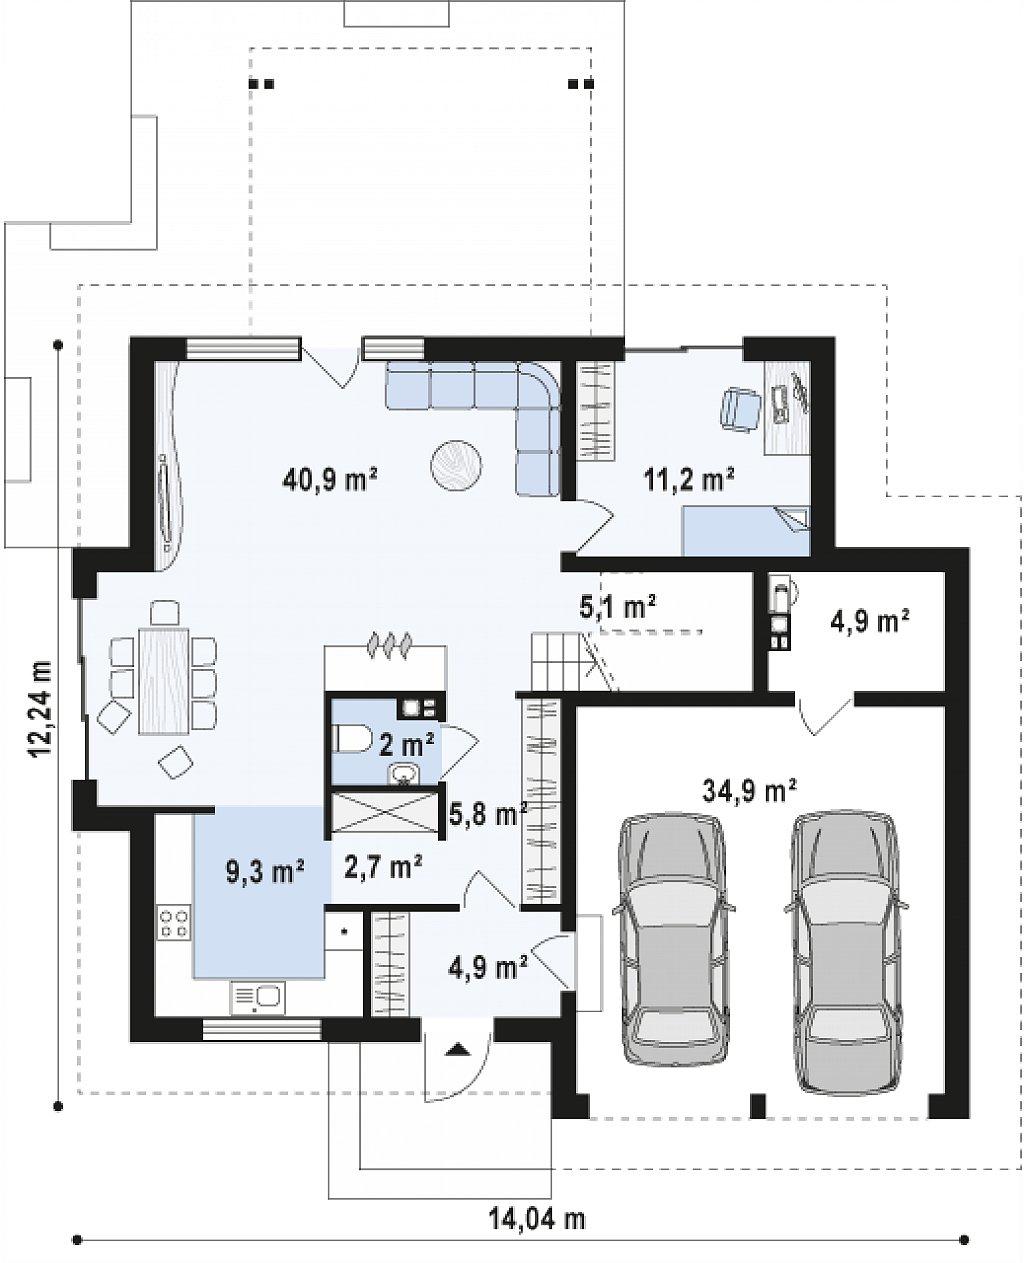 Версия проекта Z270 с альтернативной планировкой мансардного этажа. план помещений 1